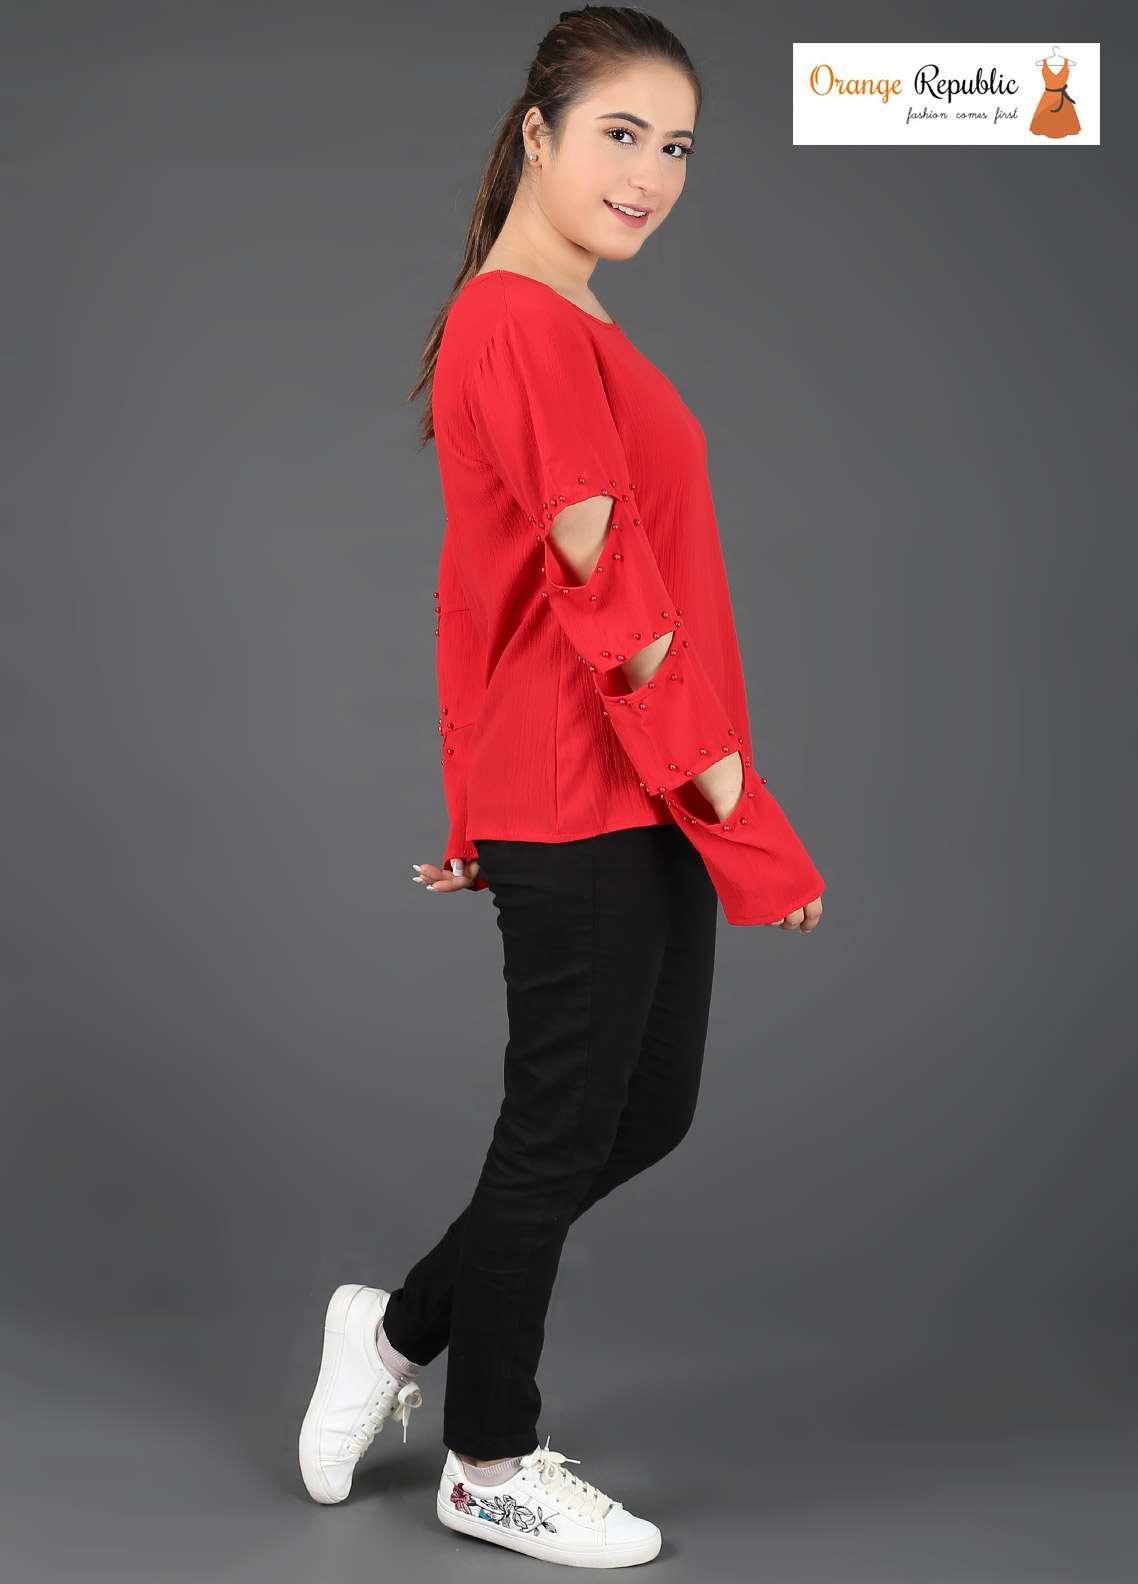 Orange Republic Fancy Style Bubble Chiffon Stitched Tops USA-01 Red